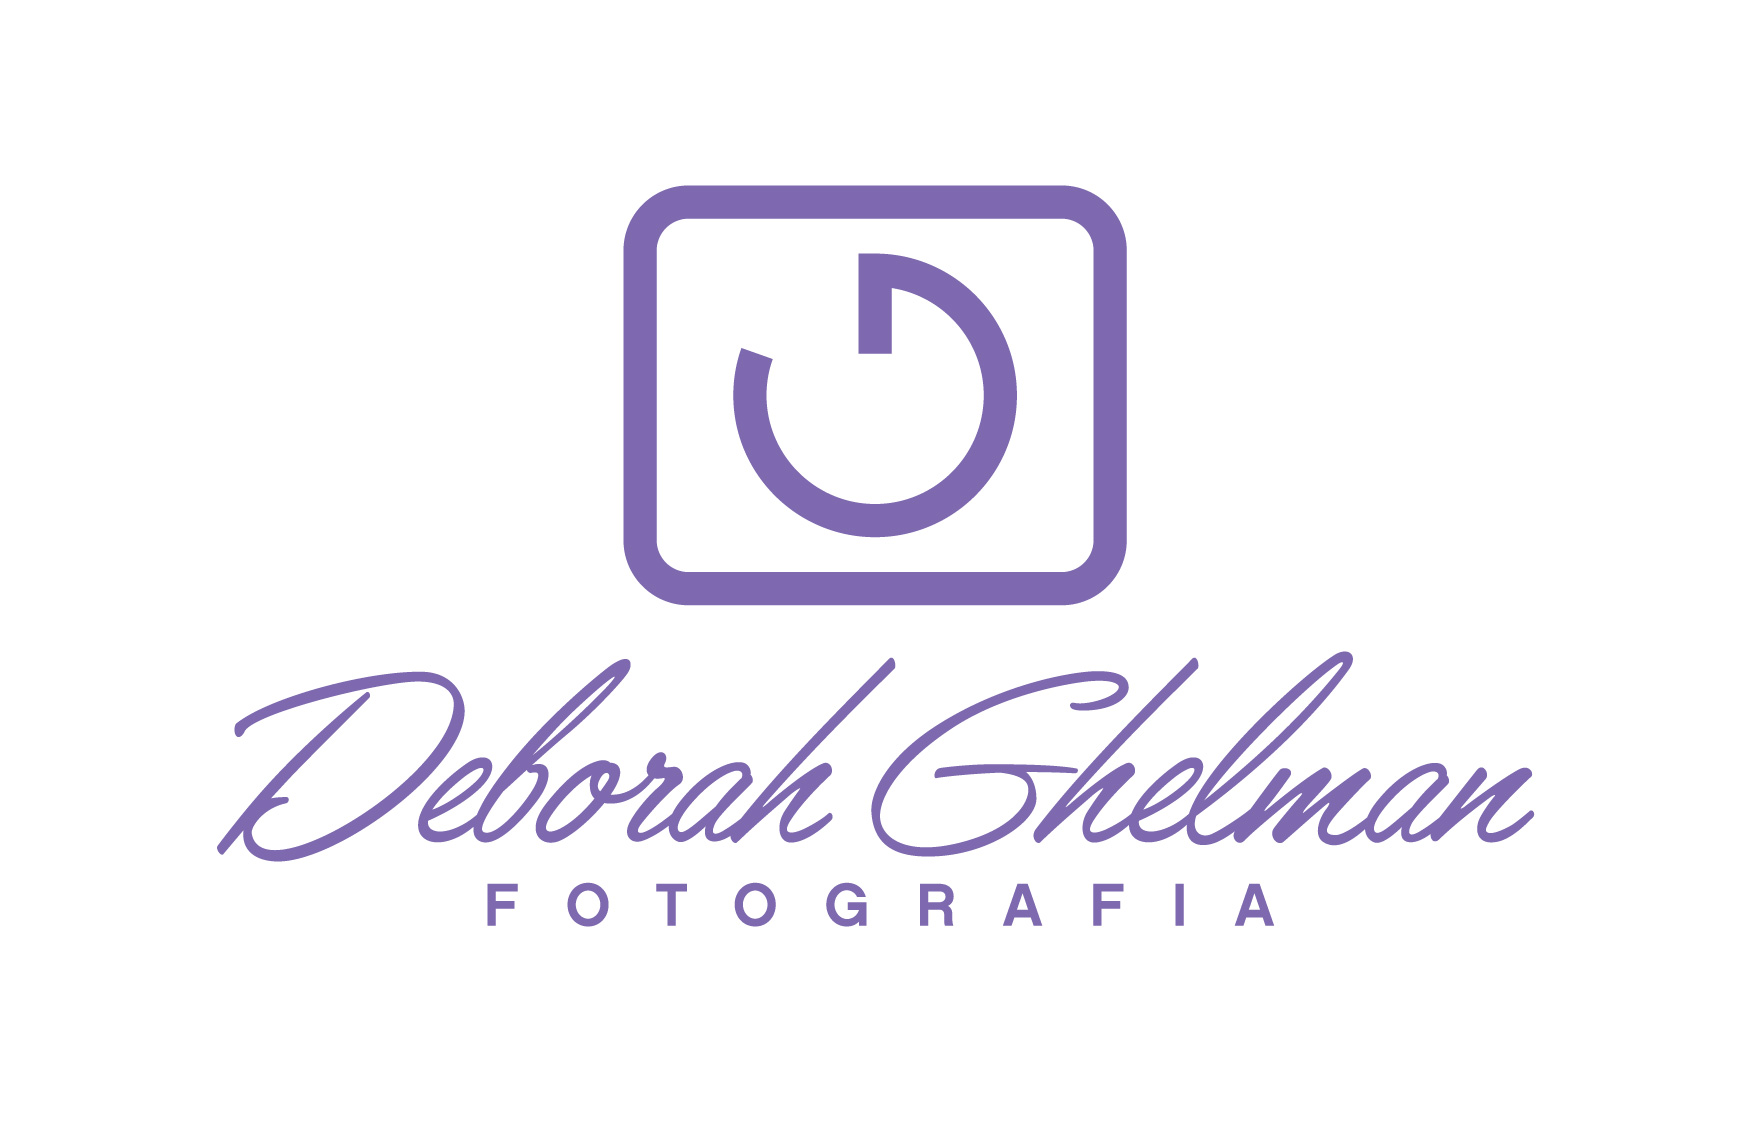 (c) Deborahghelman.com.br